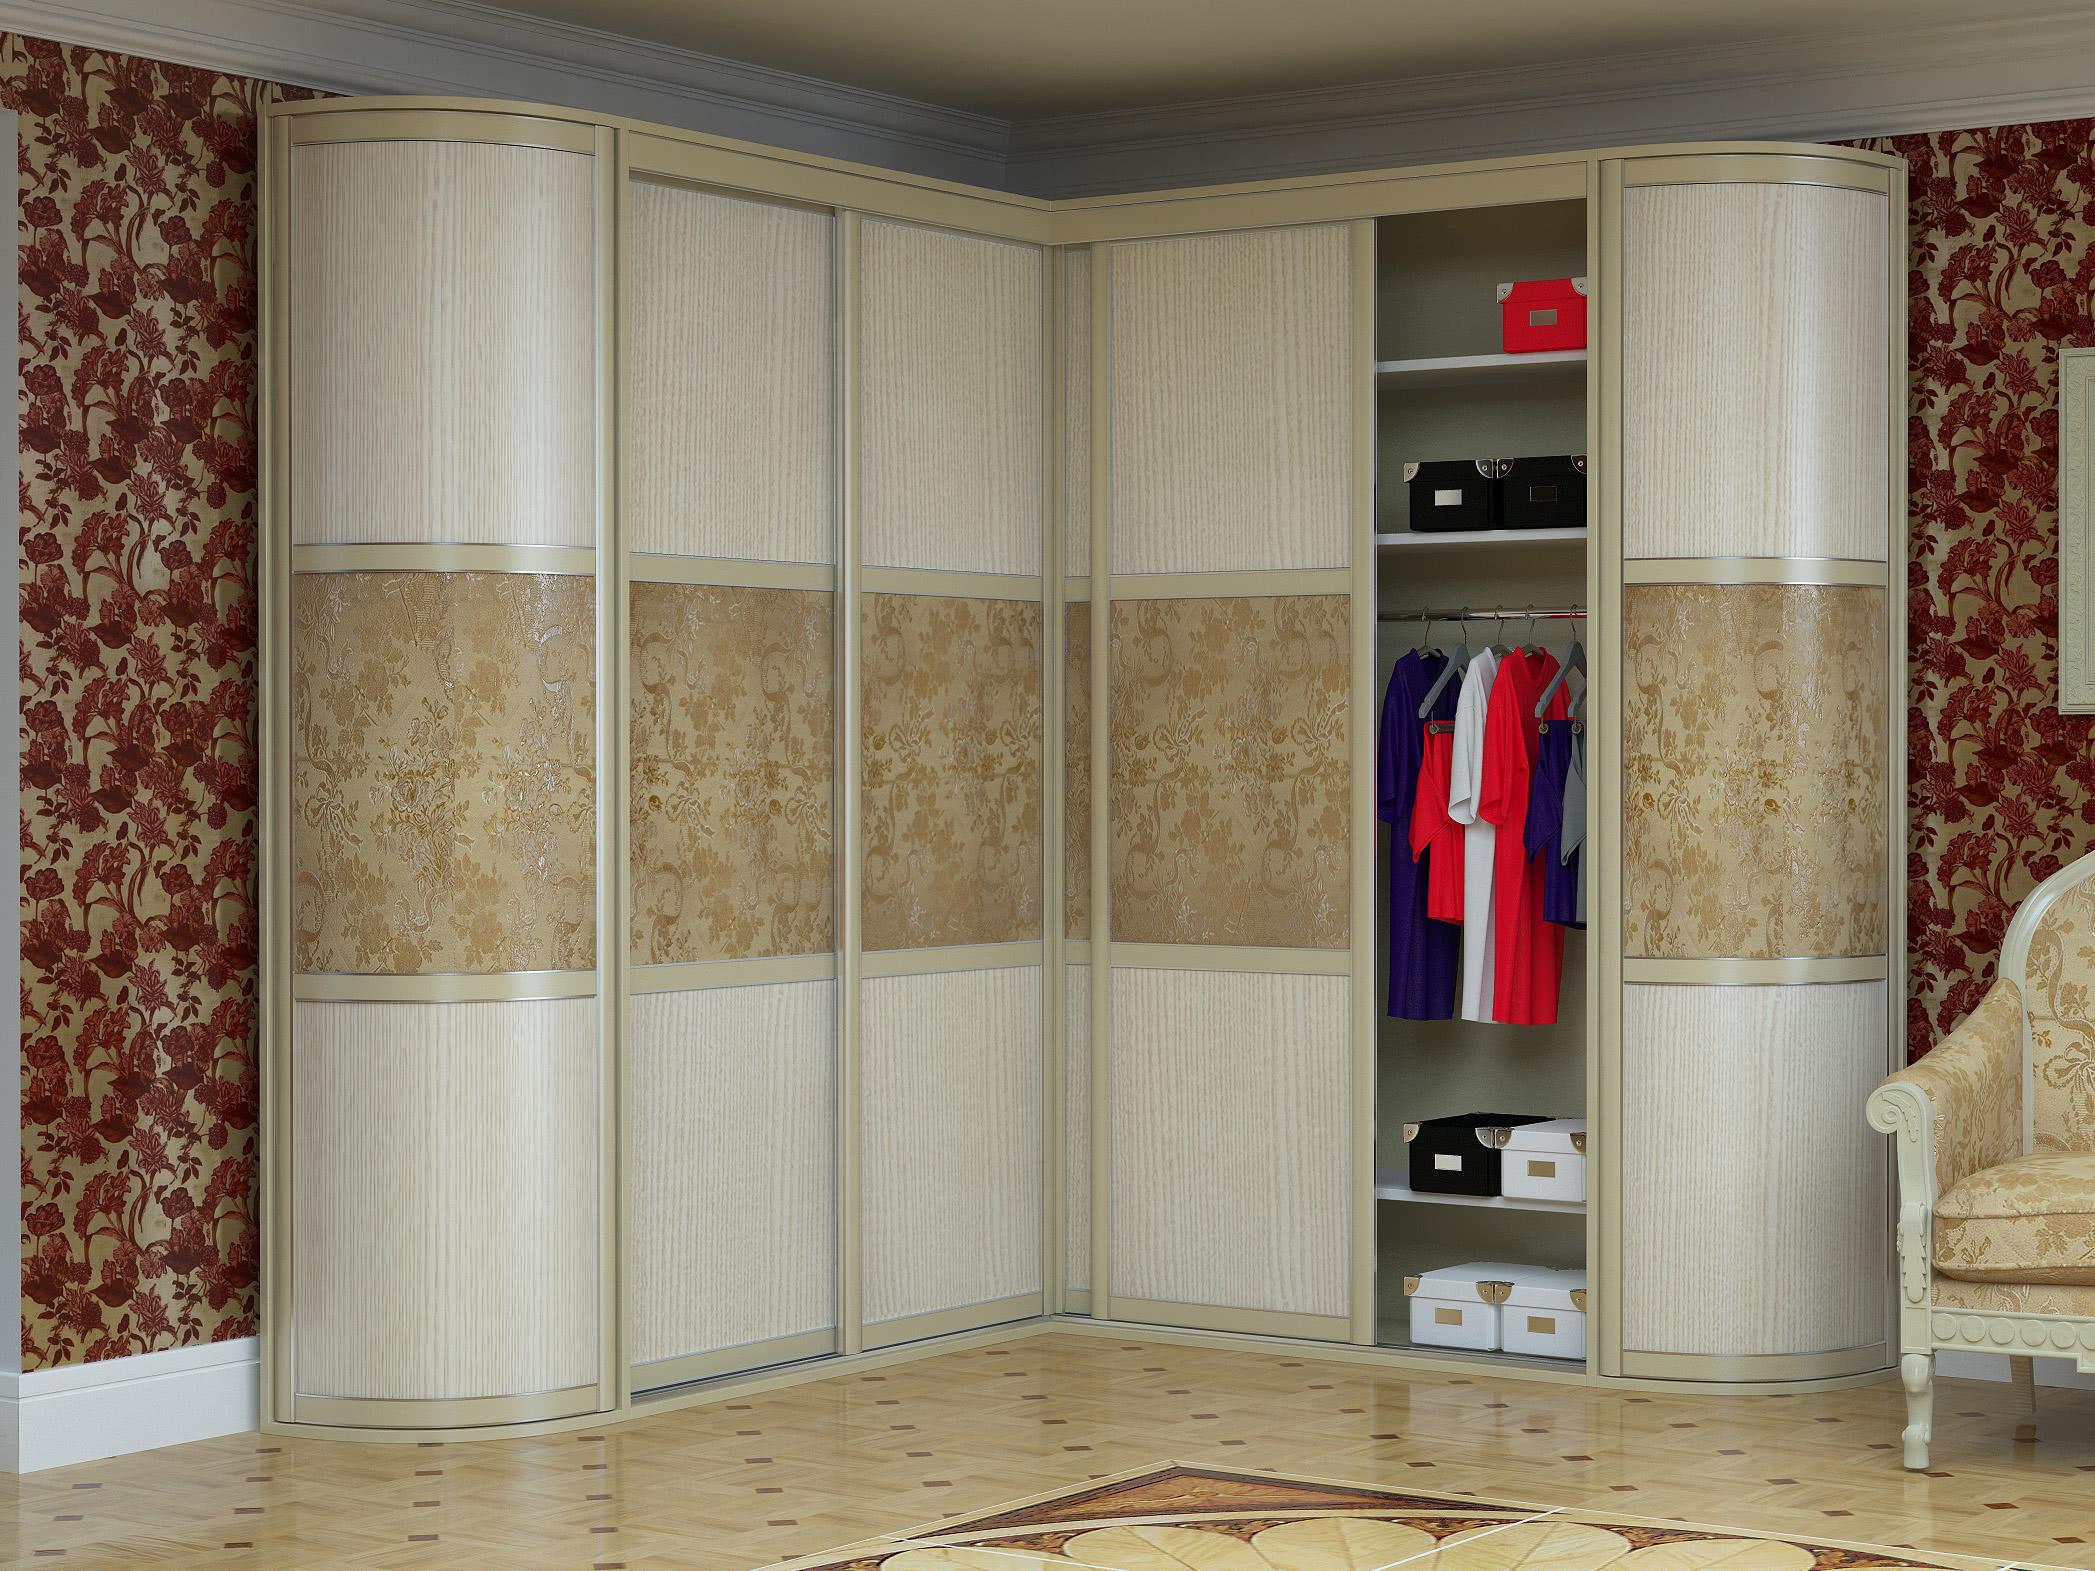 Шкафы купе с фотопечатью балтийский шкаф: купить шкафы недор.